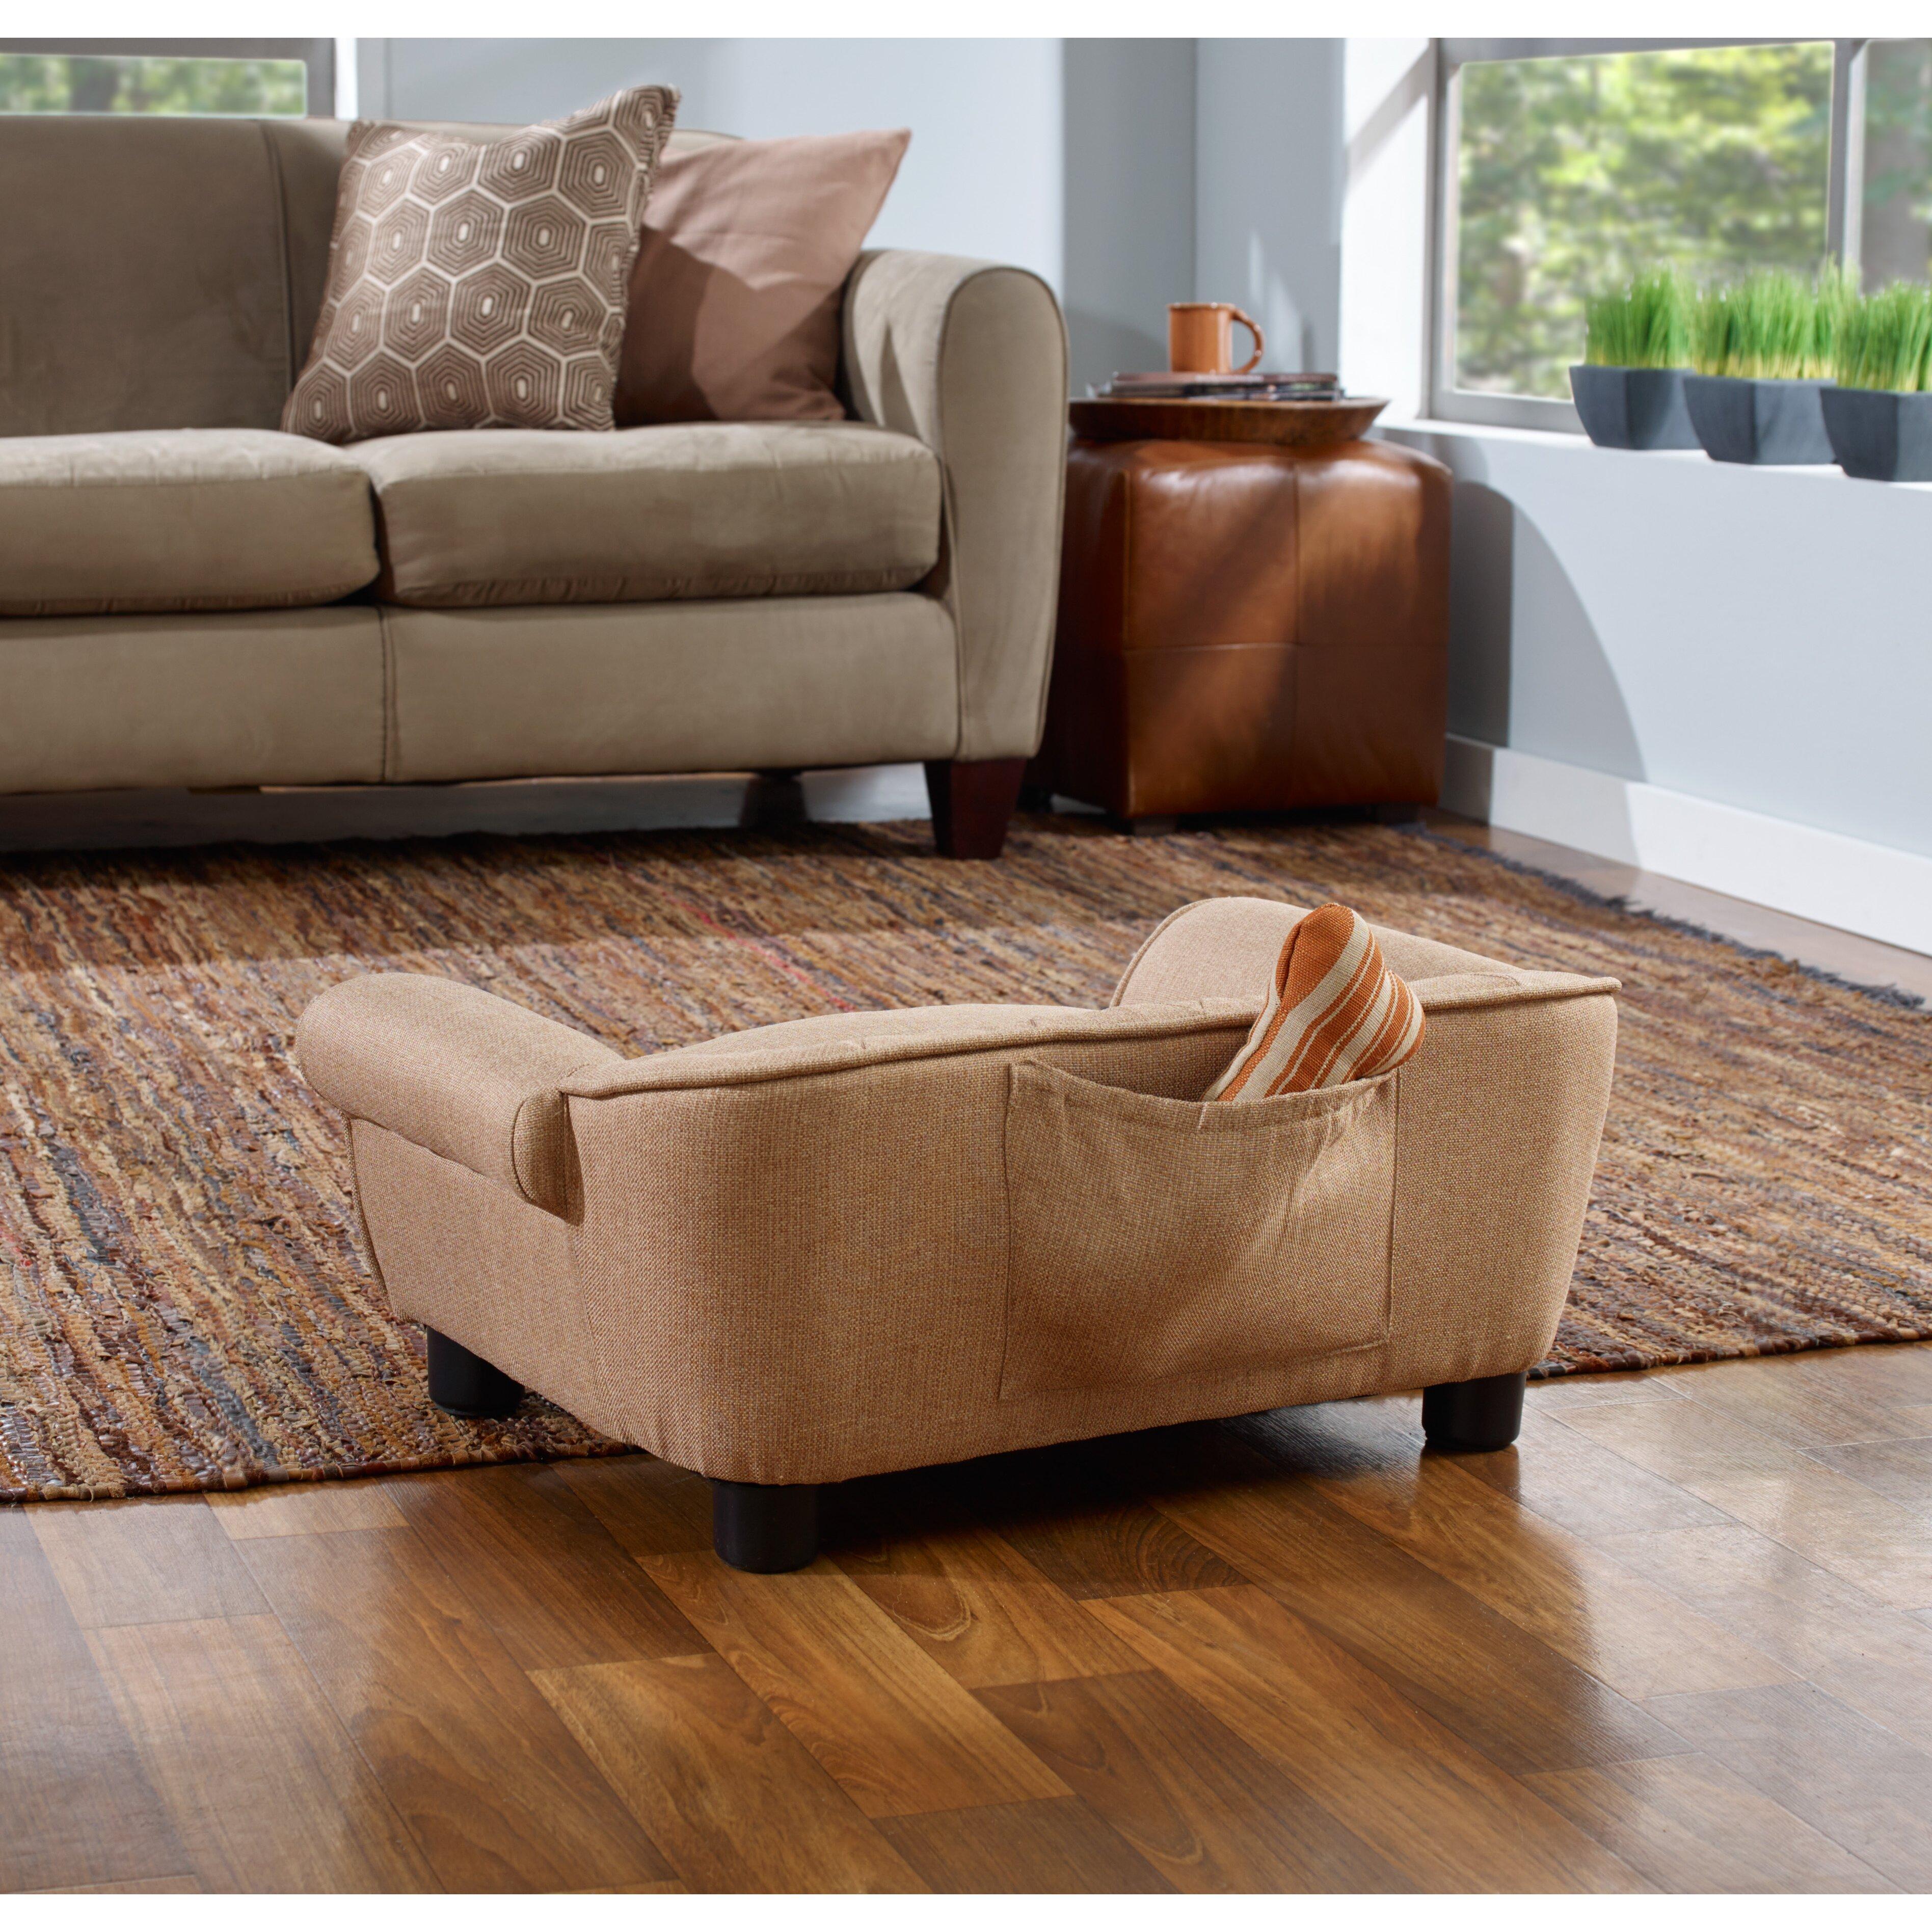 Enchanted Home Pet Sydney Sofa Dog Bed & Reviews